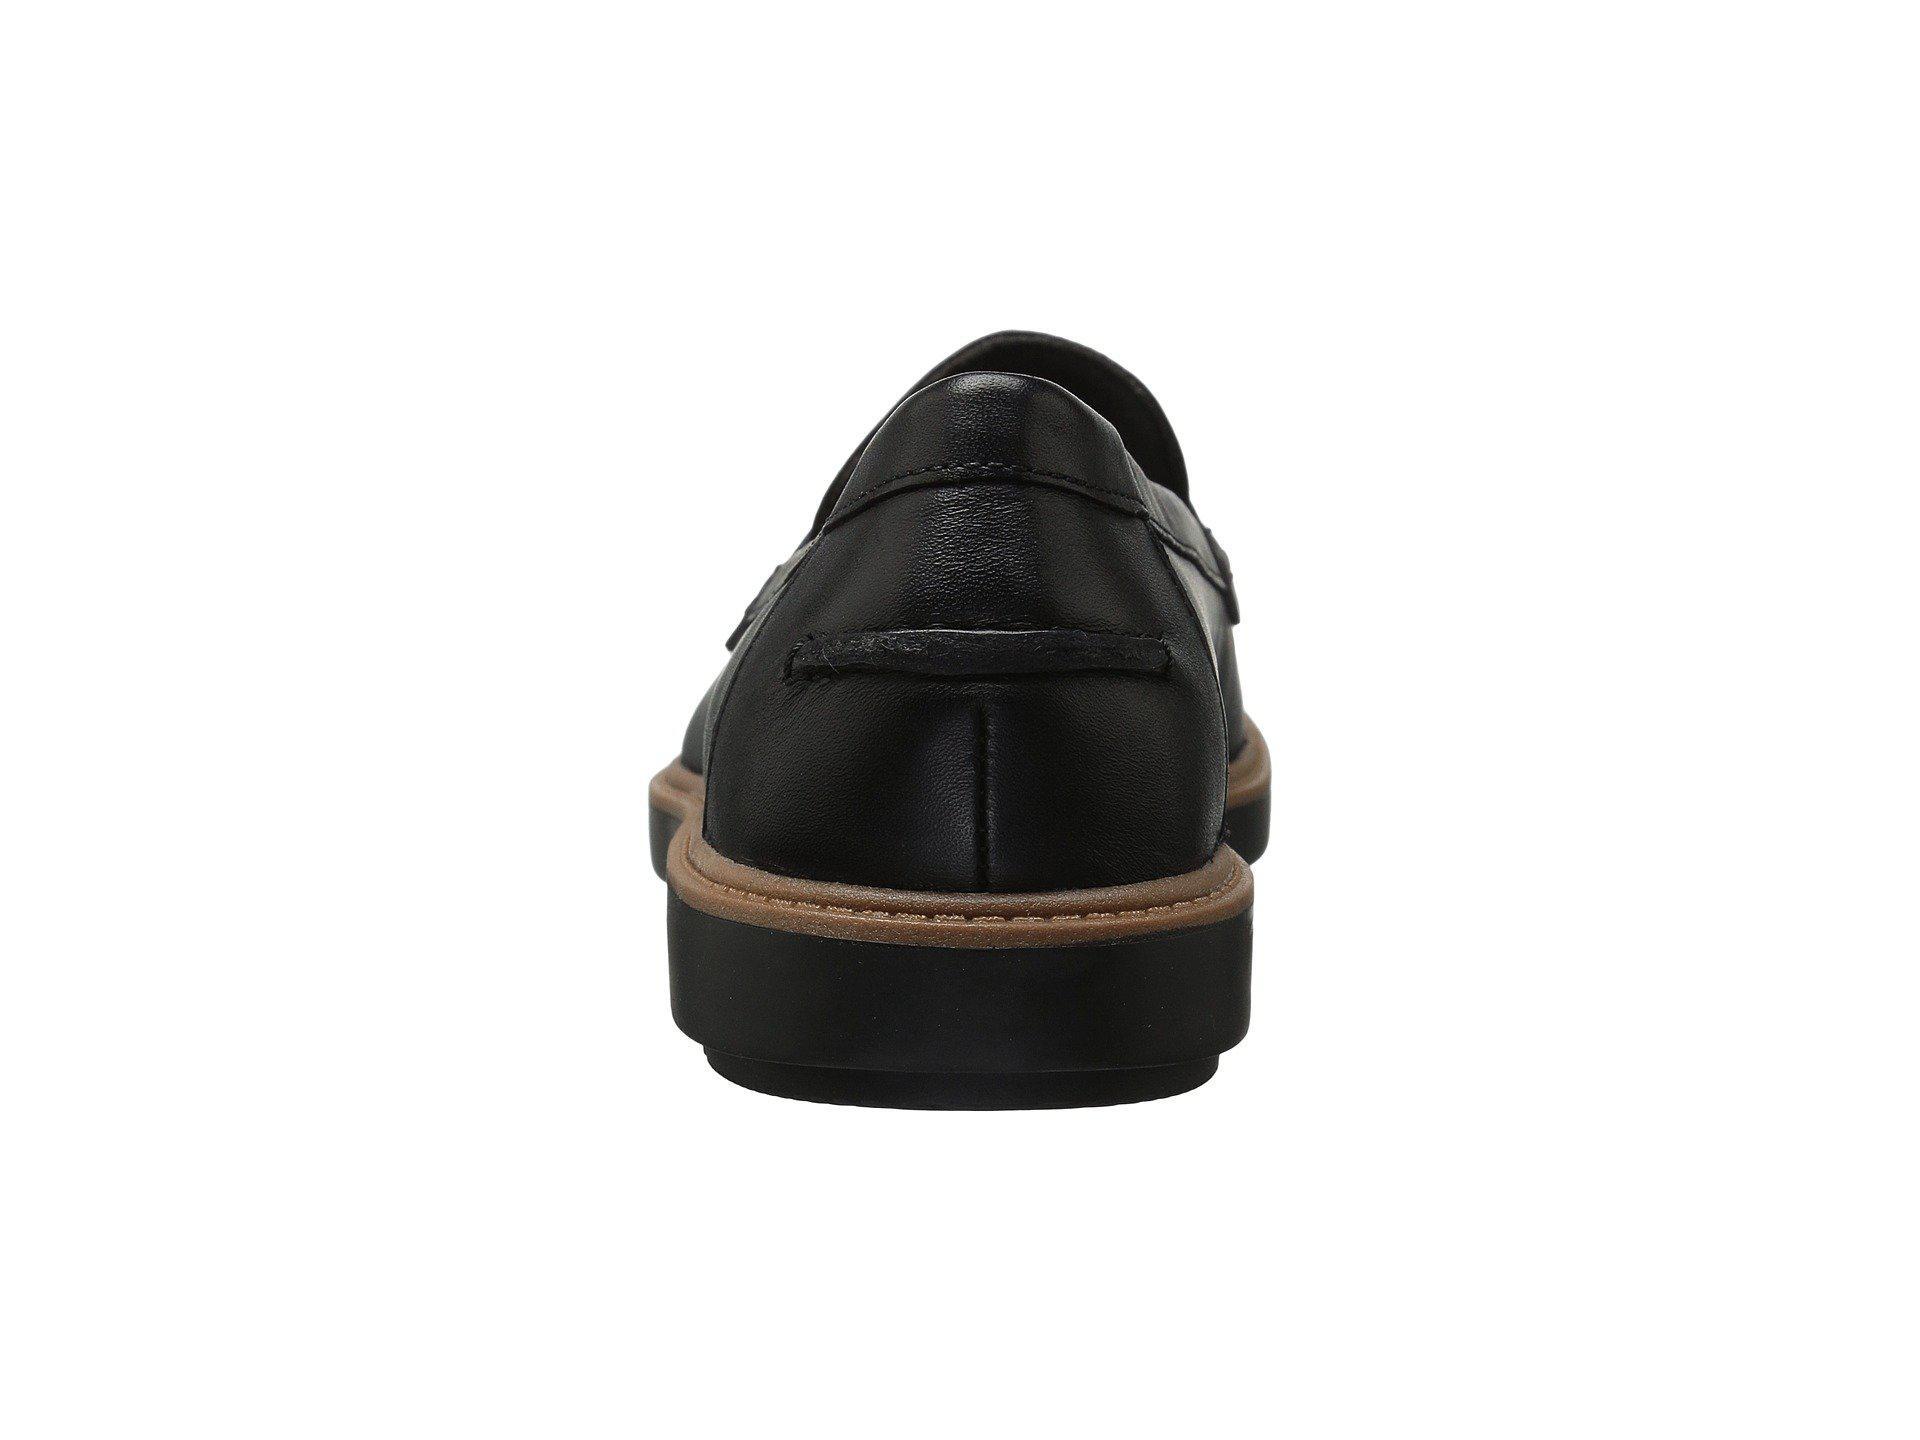 8a893559899 Lyst - Clarks Raisie Eletta (black Leather) Women s Slip On Shoes in Black  - Save 53%